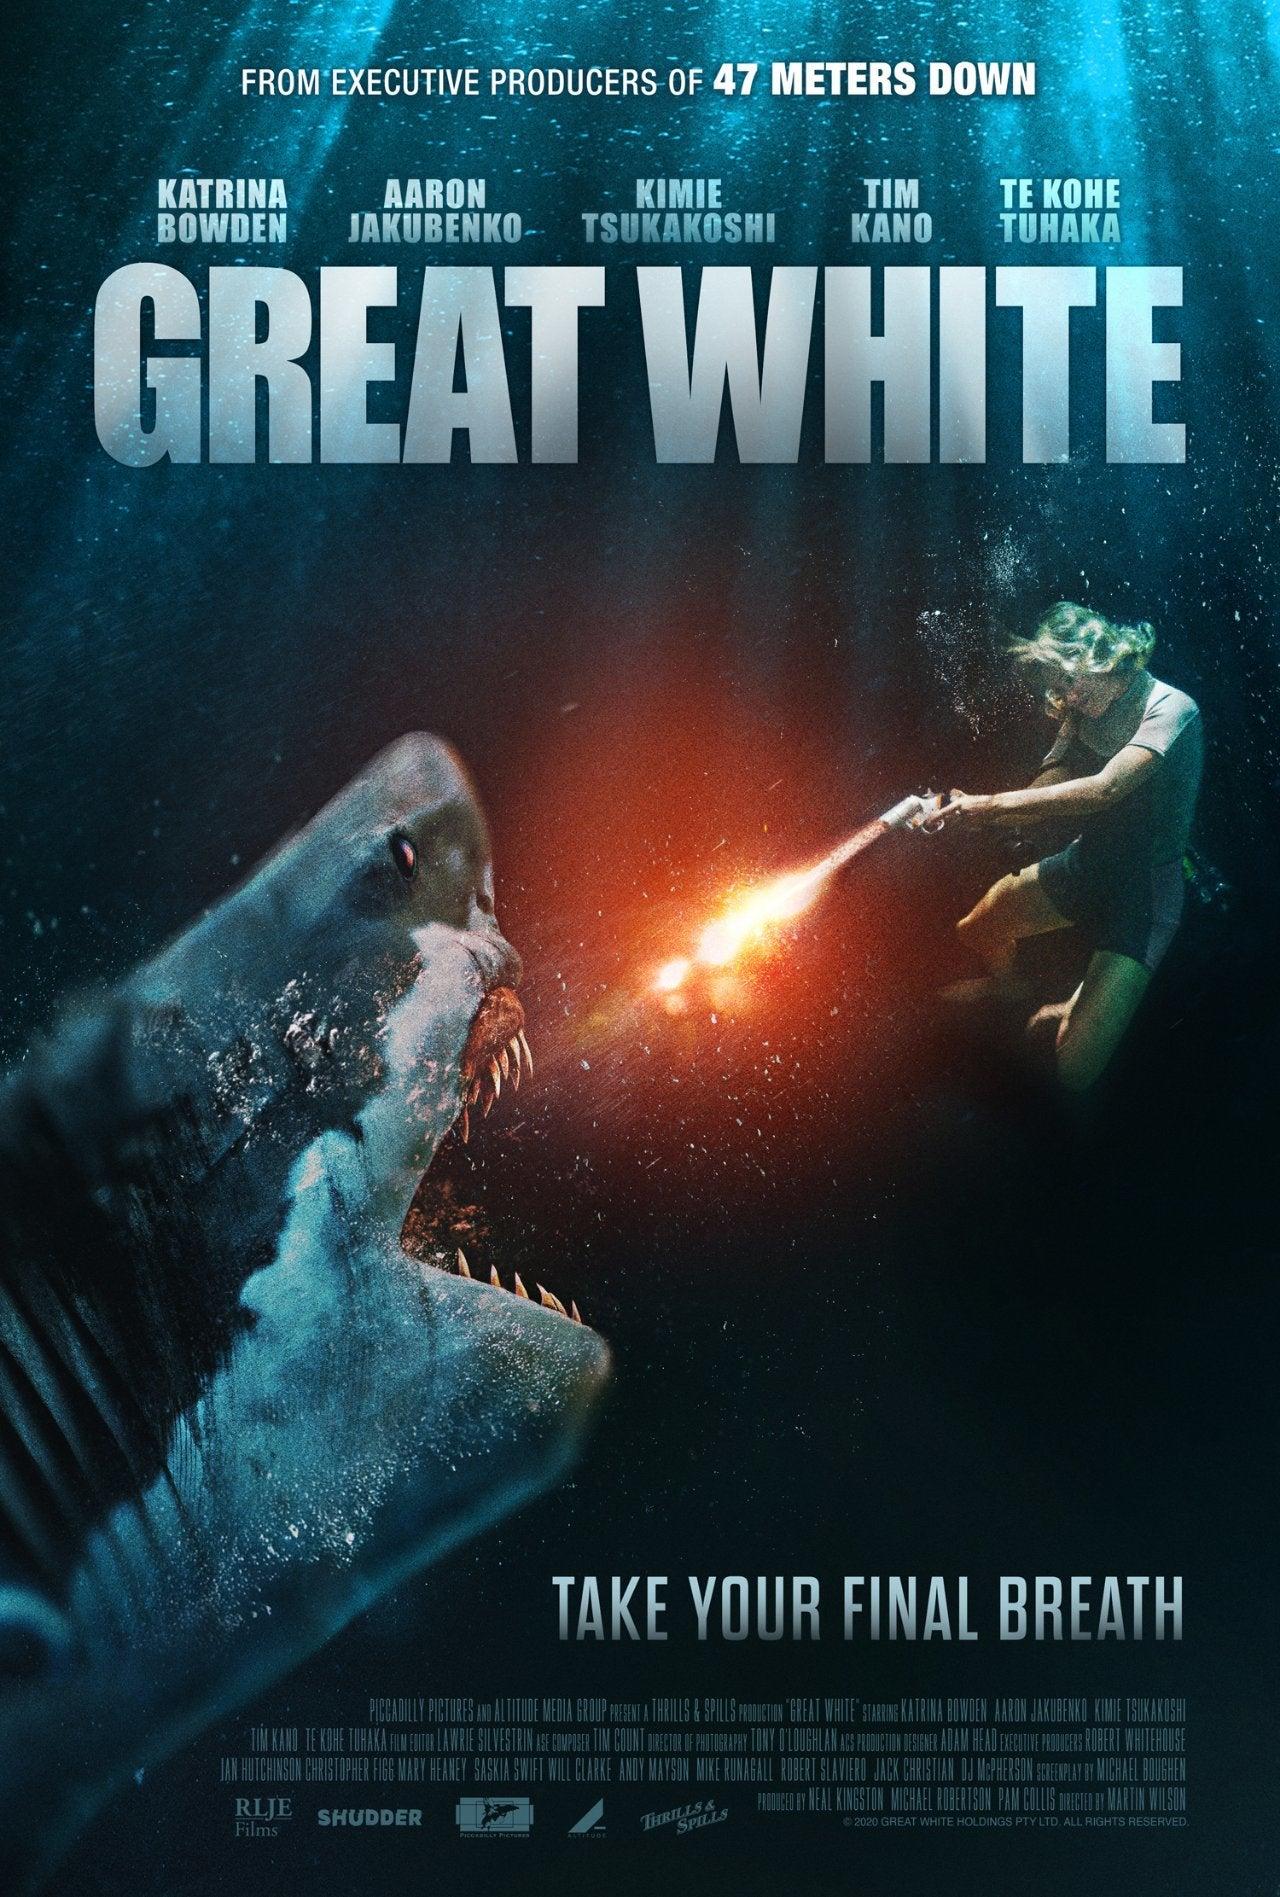 great white movie poster horror film katrina bowden 2021